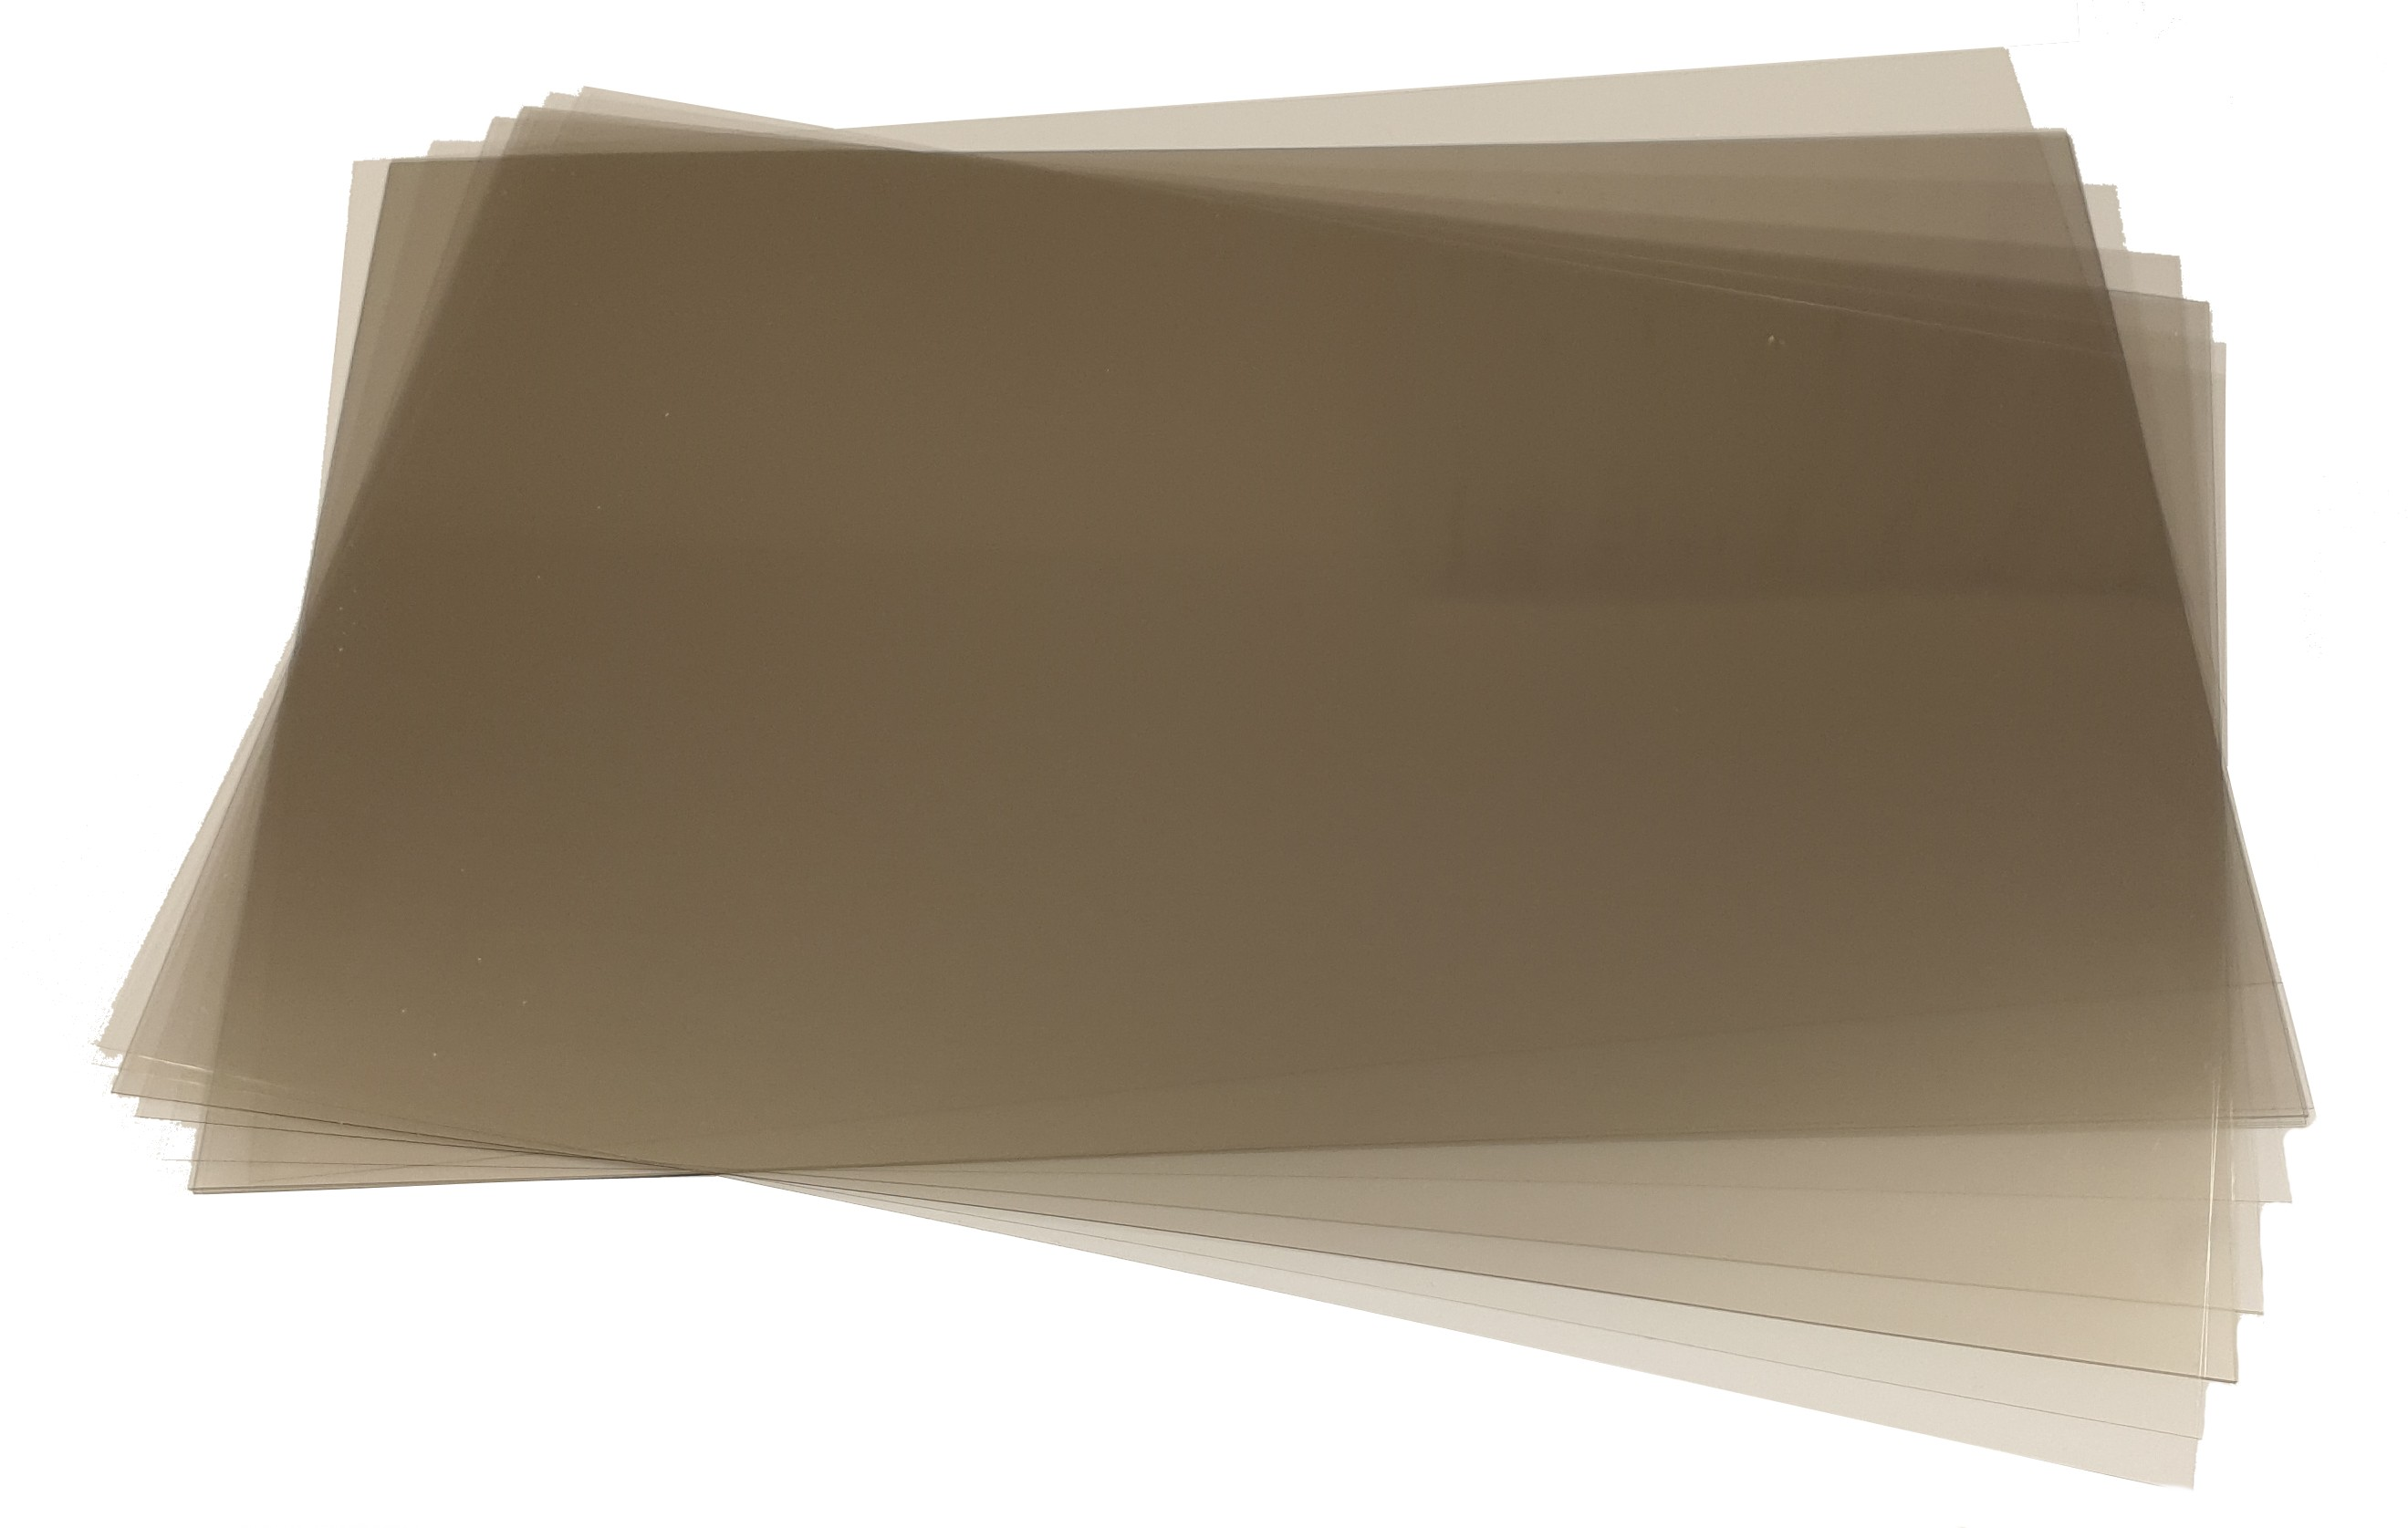 1 Pkg à 25Stk. Schutzfolie f. Kabine OE 1000